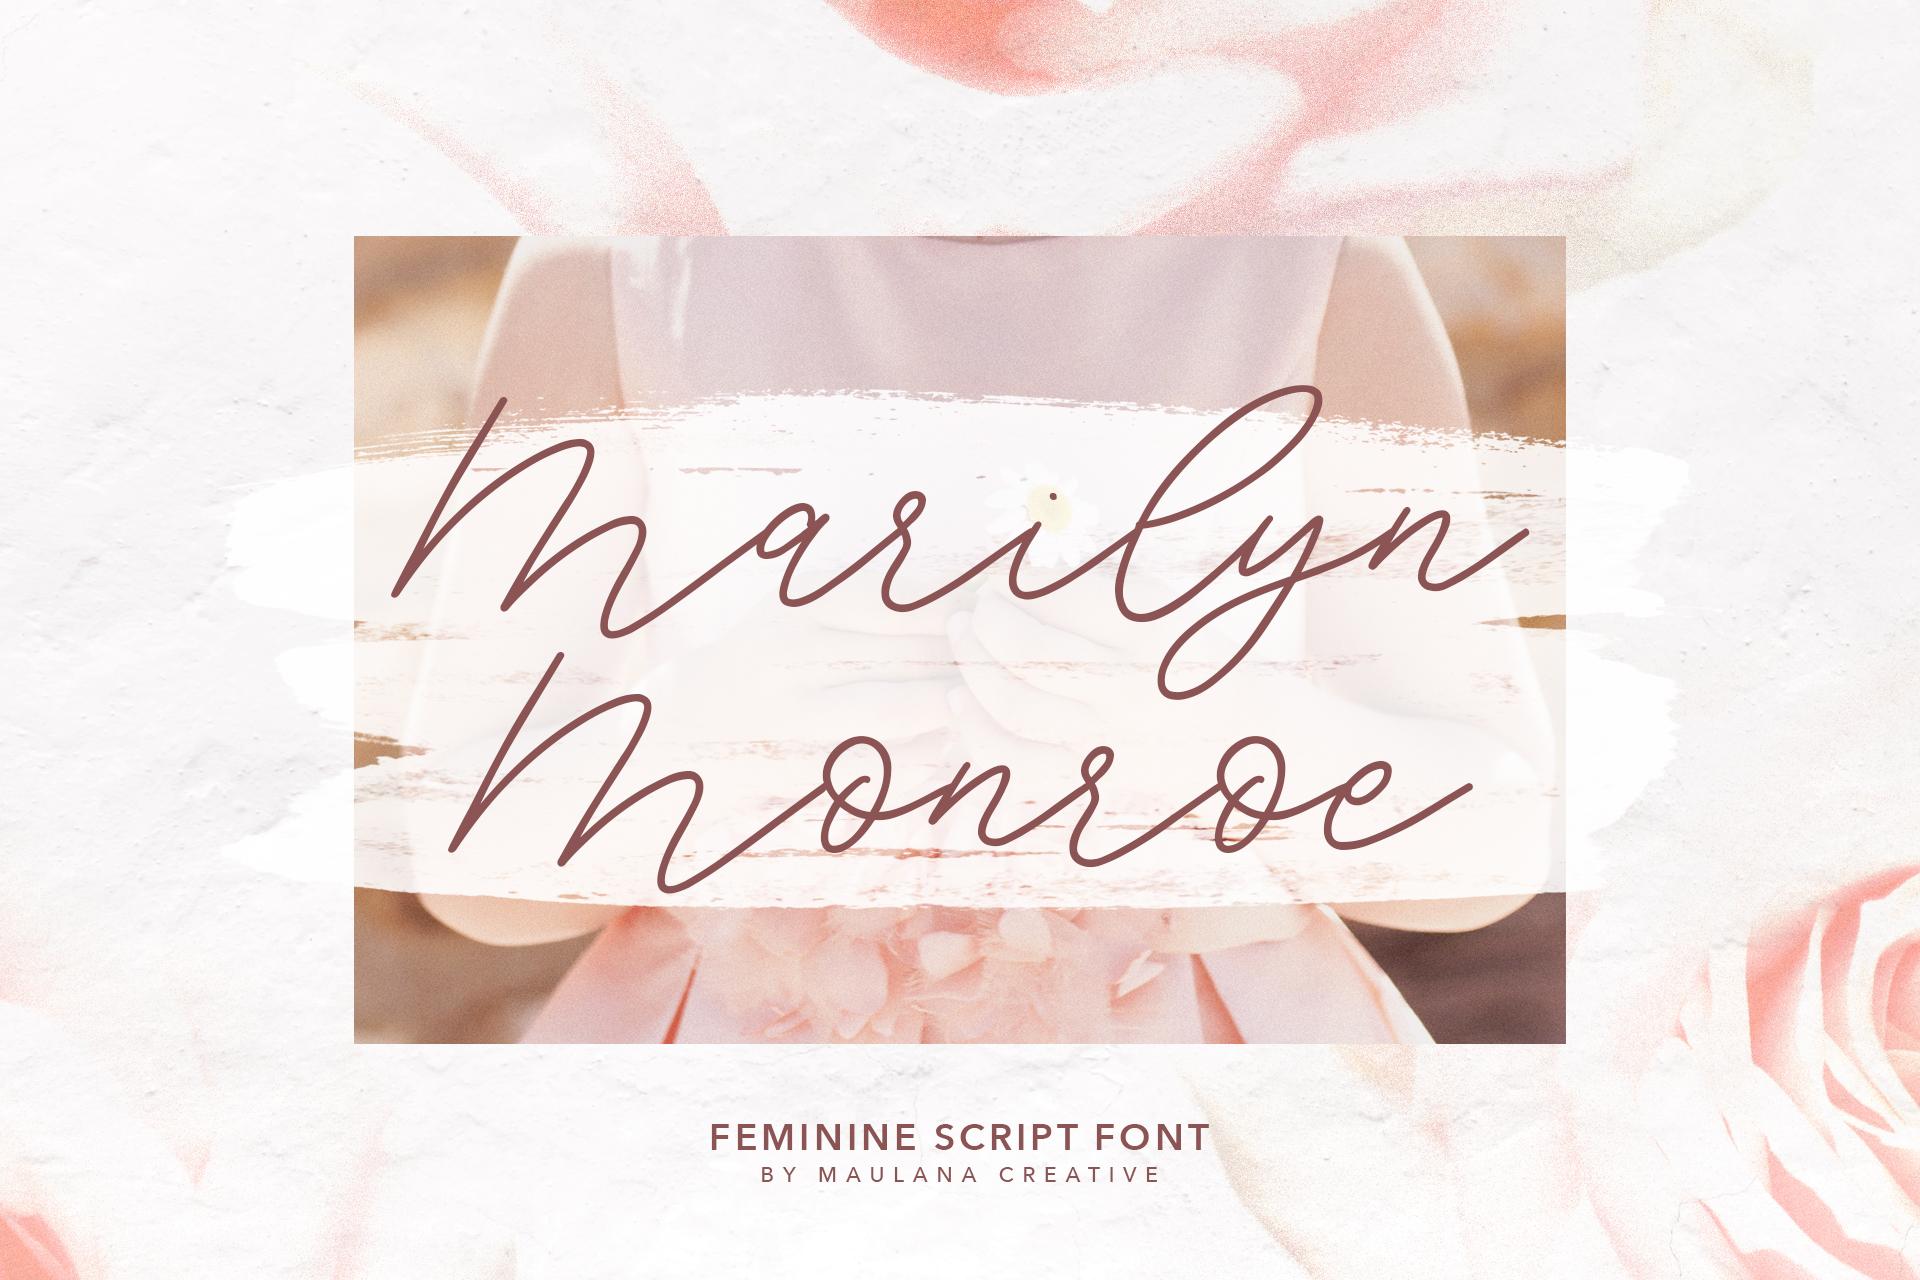 Southwide Feminine Script Font example image 9